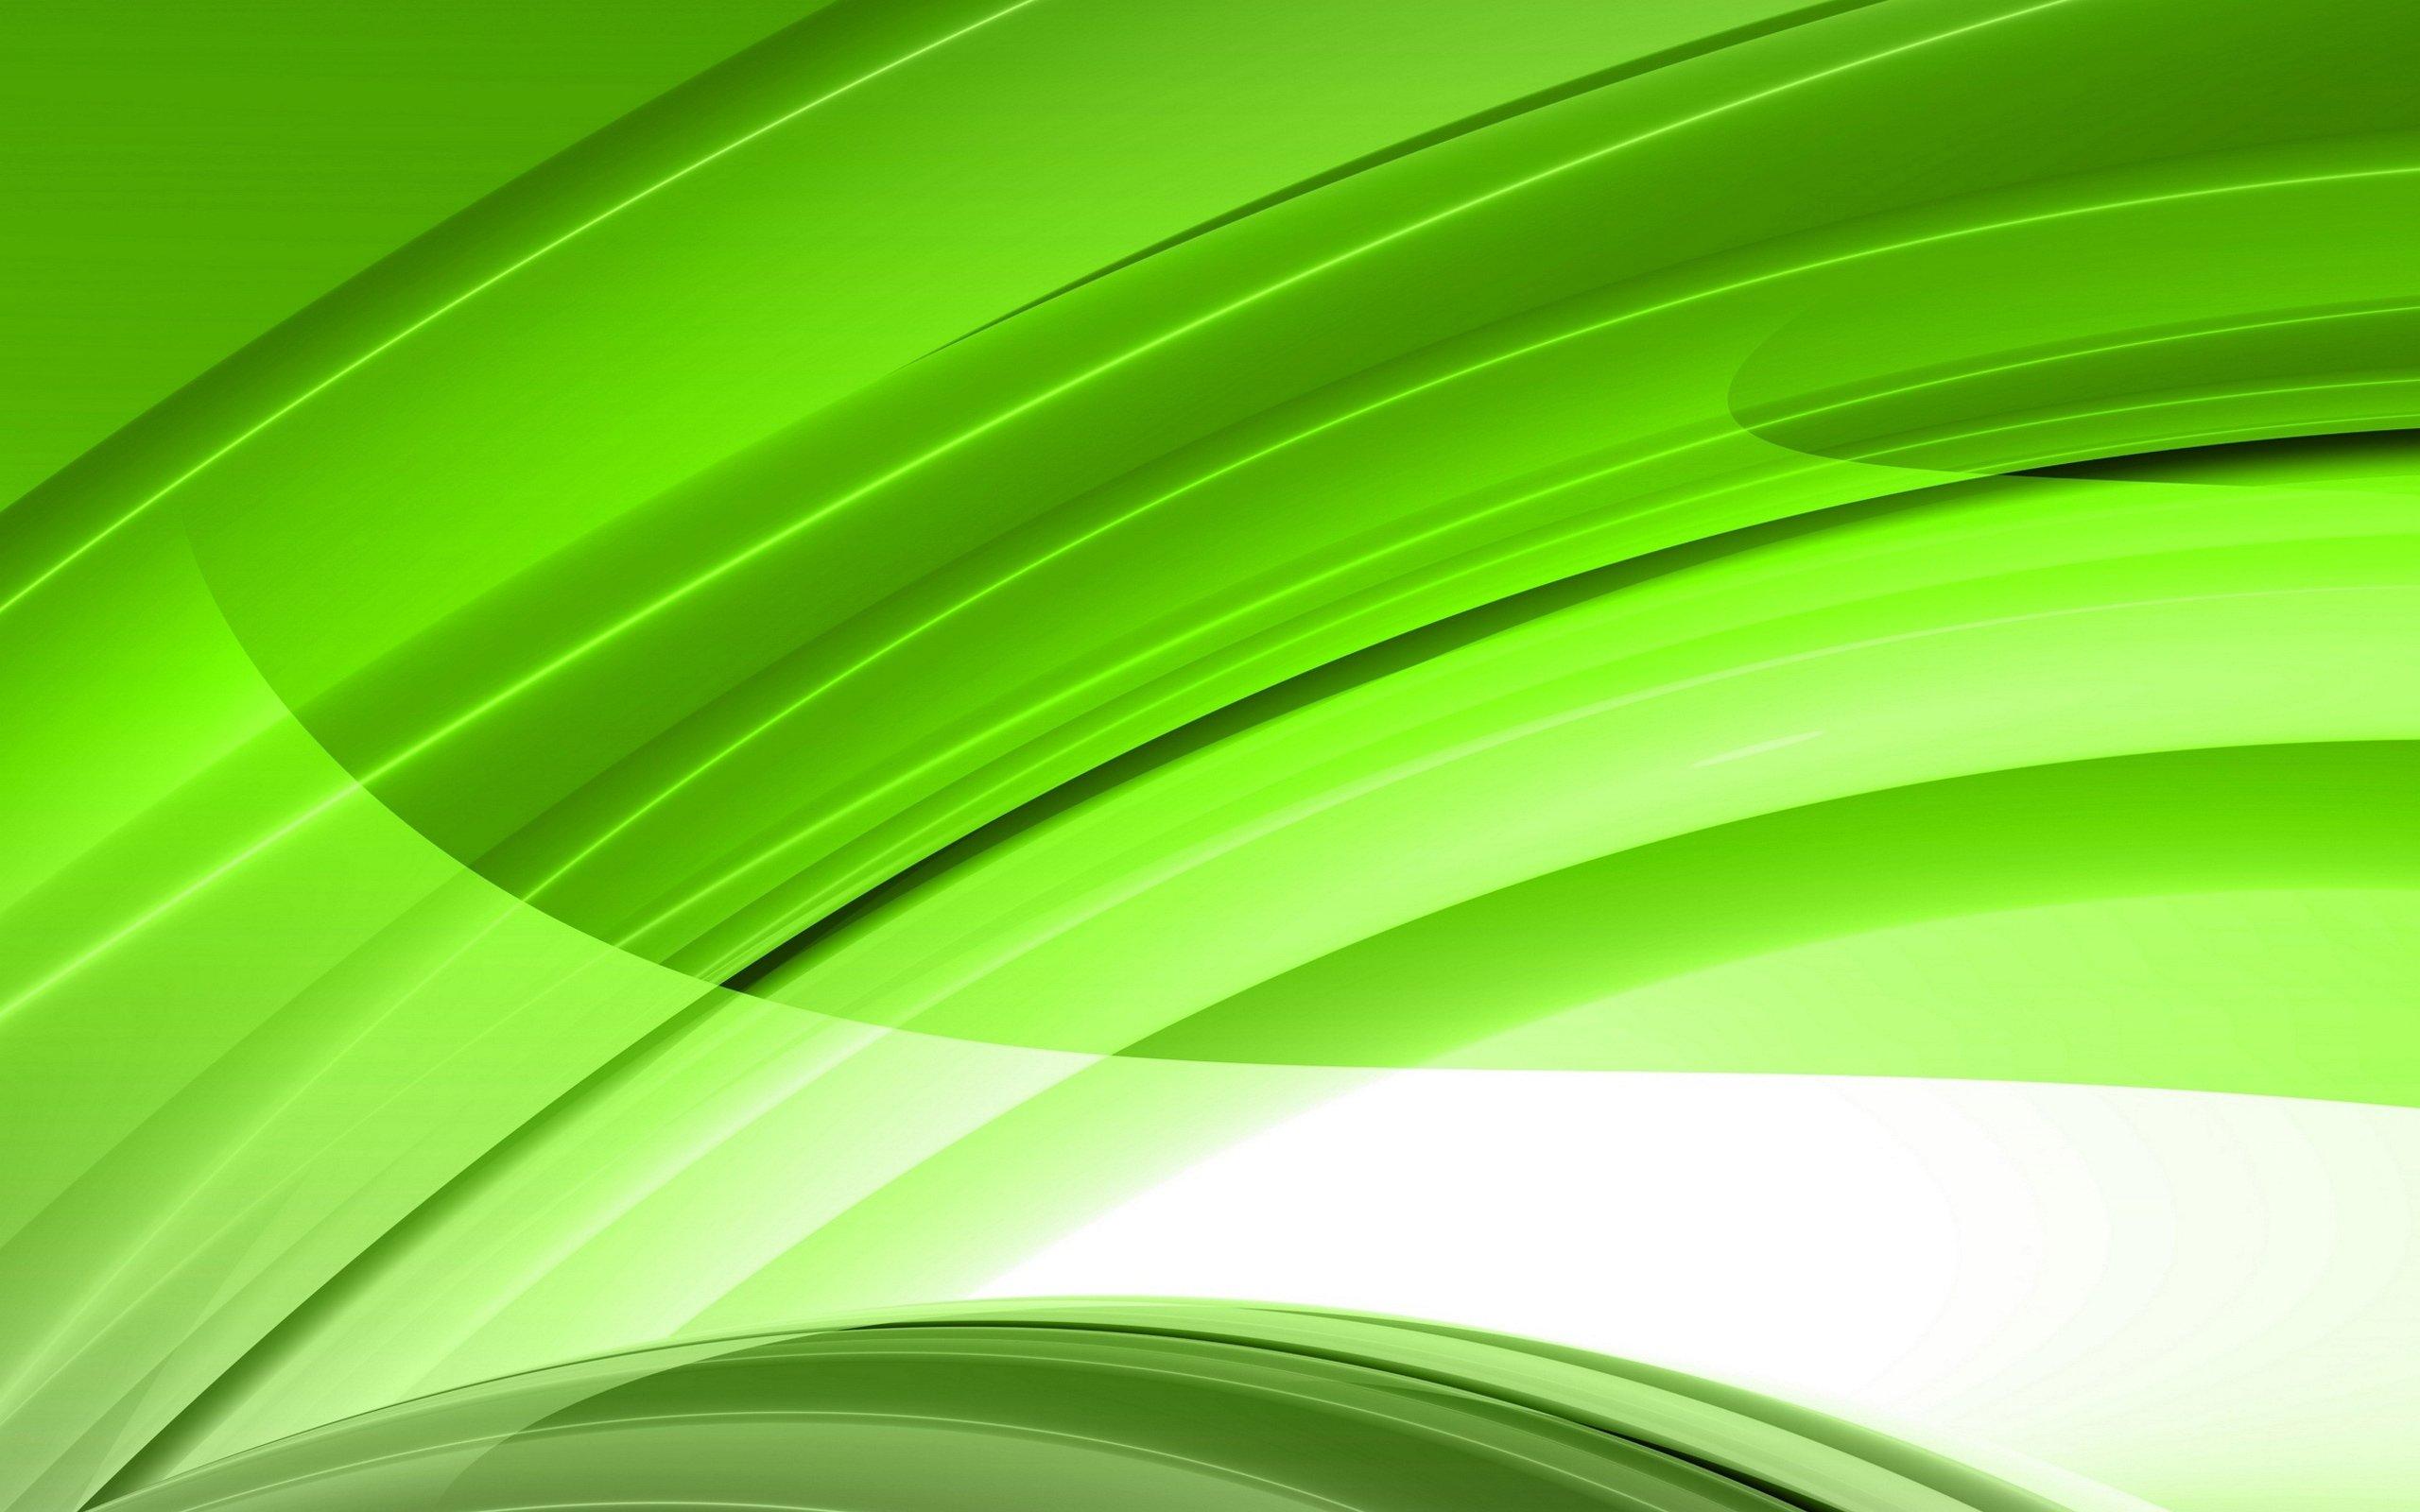 [77+] Abstract Green Wallpaper on WallpaperSafariGreen Abstract Wallpaper